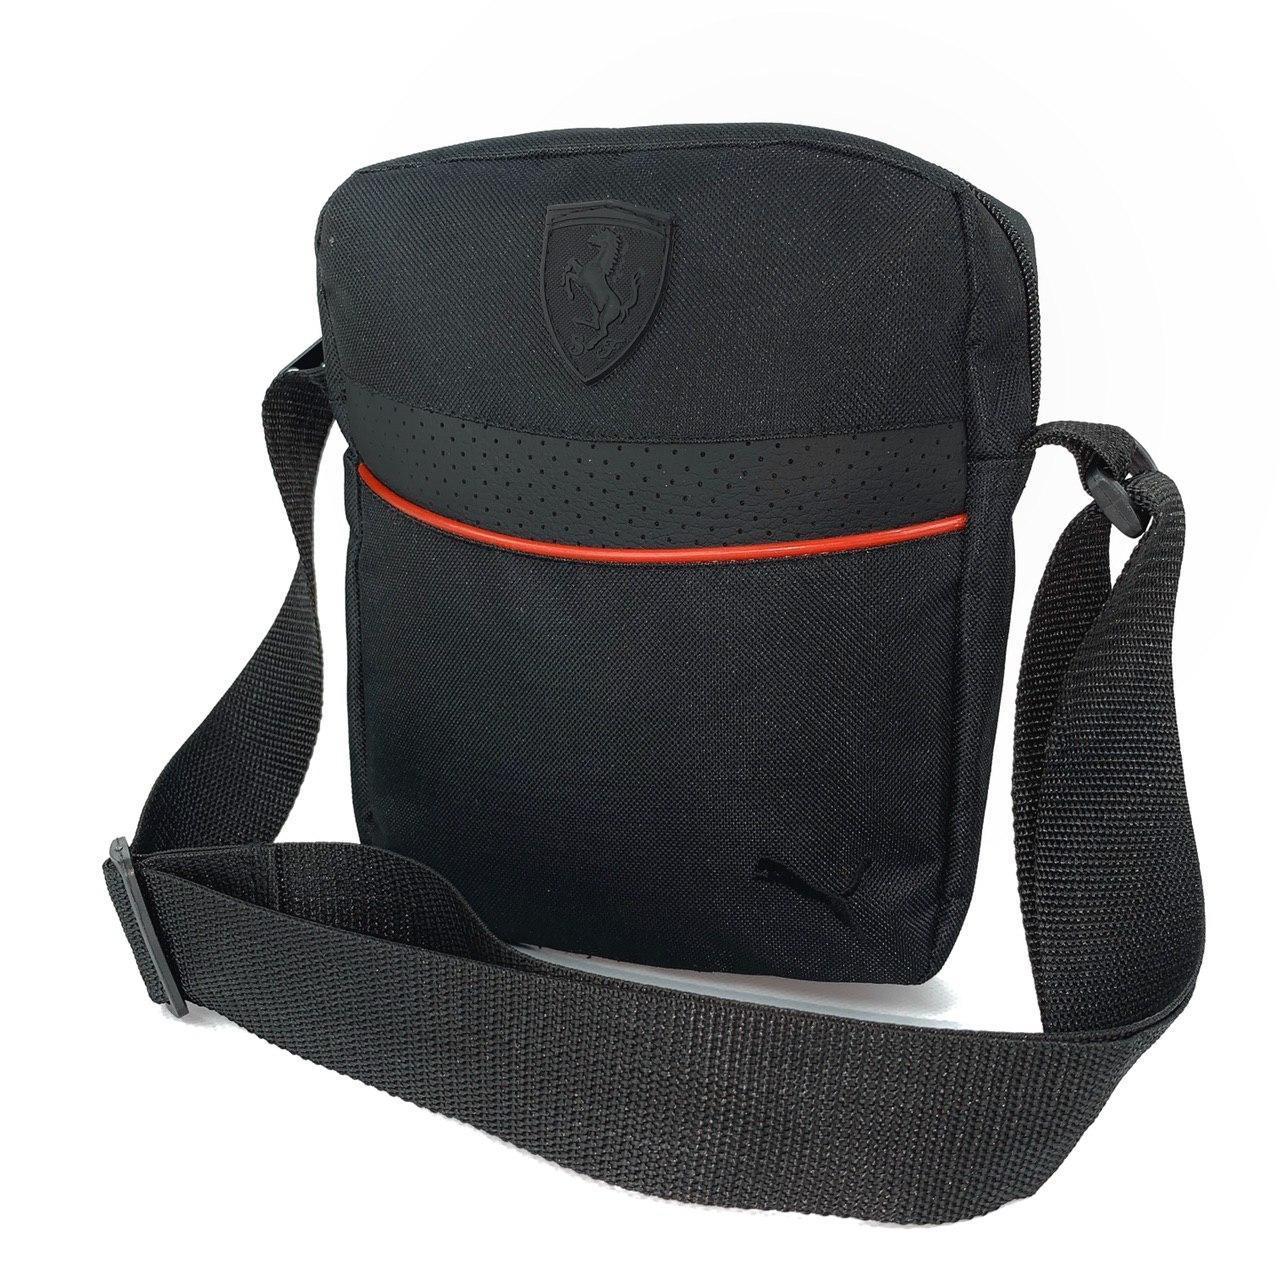 Мужская барсетка Puma Ferrari черная (Пума Ферари) сумка через плечо